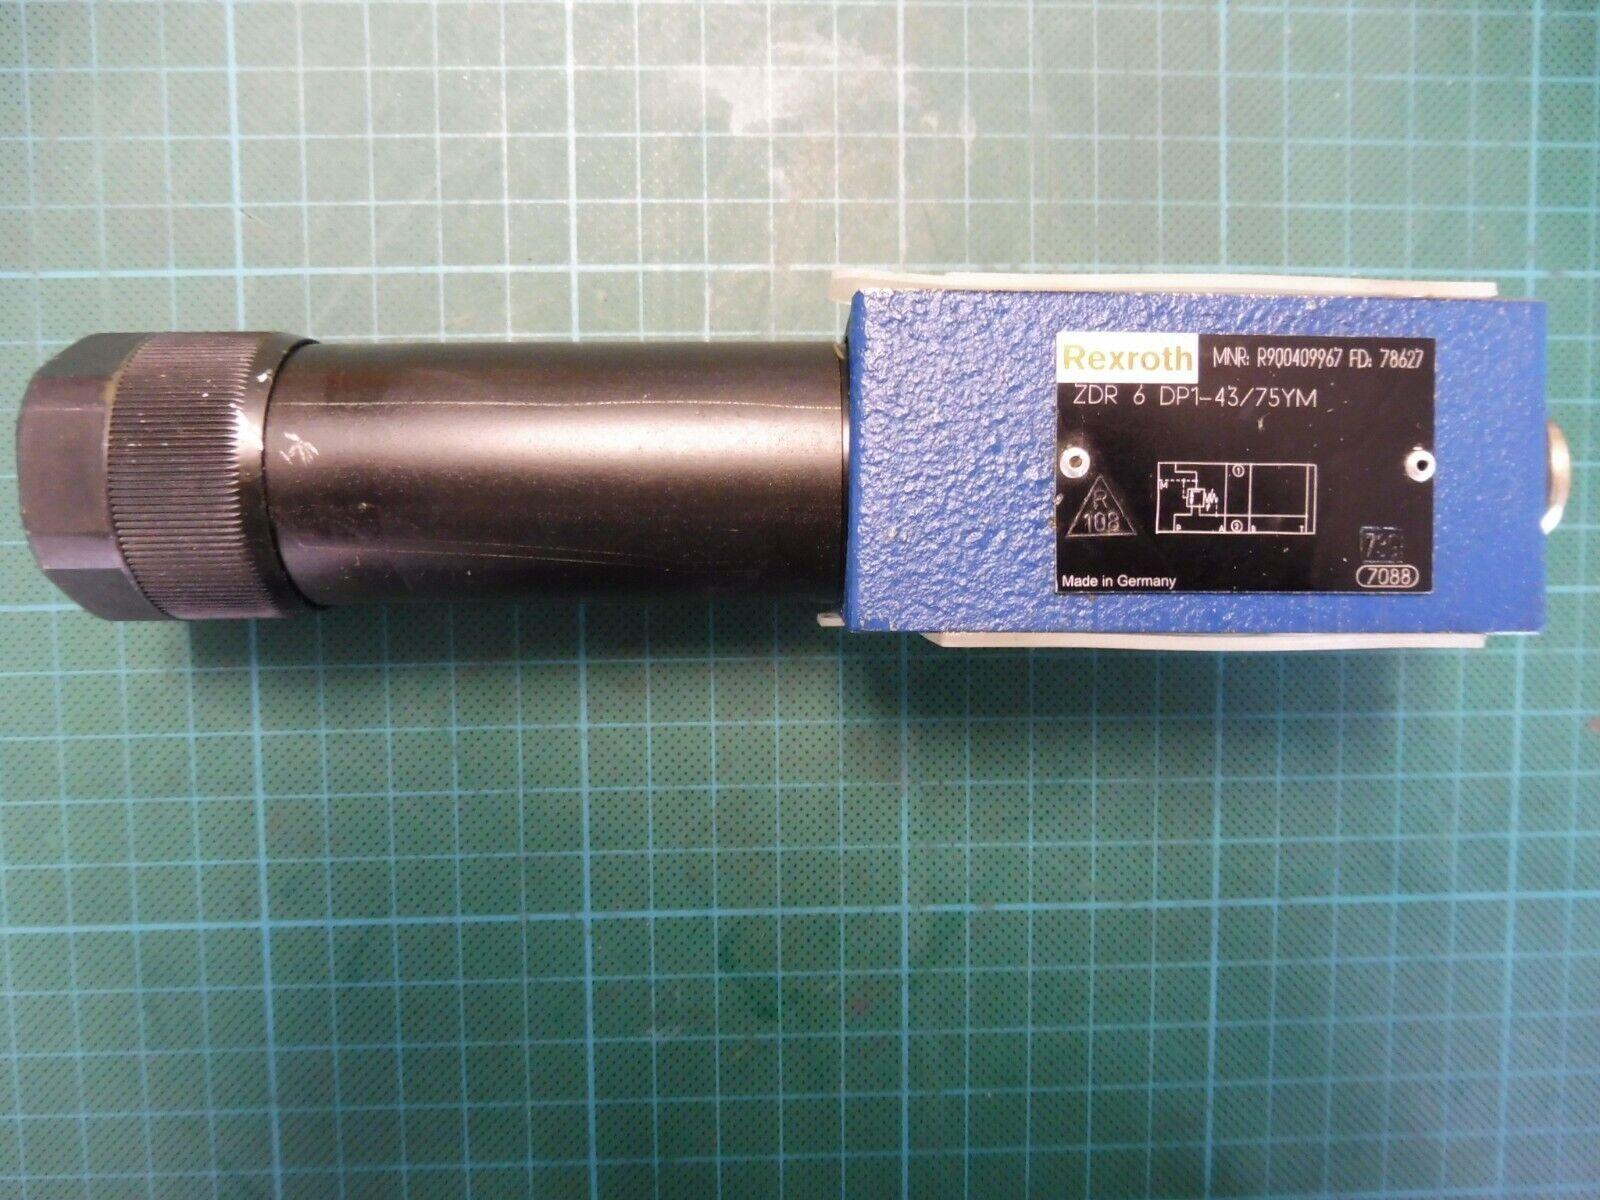 1 x Rexroth druckreduzierventil ZDR 6 dp1-43//75ym; mnr r900409967